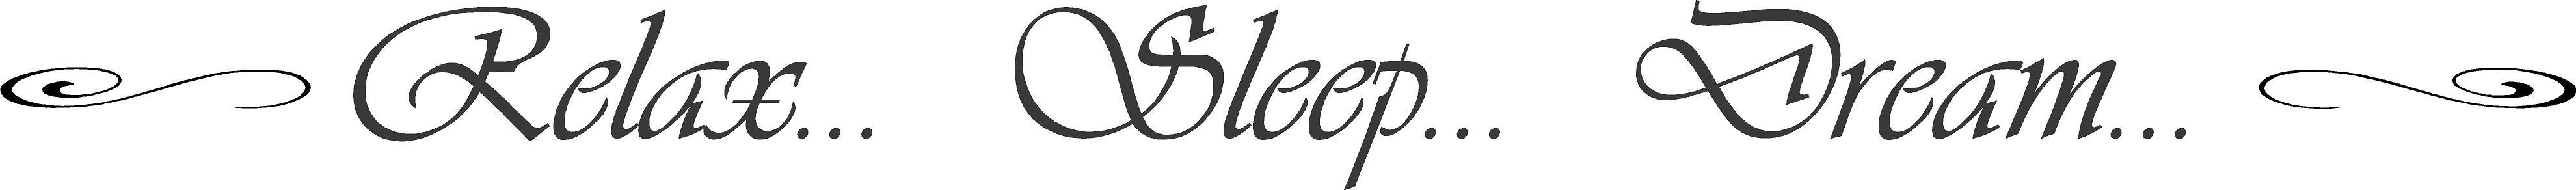 Relax Sleep Dream | Wall Decals